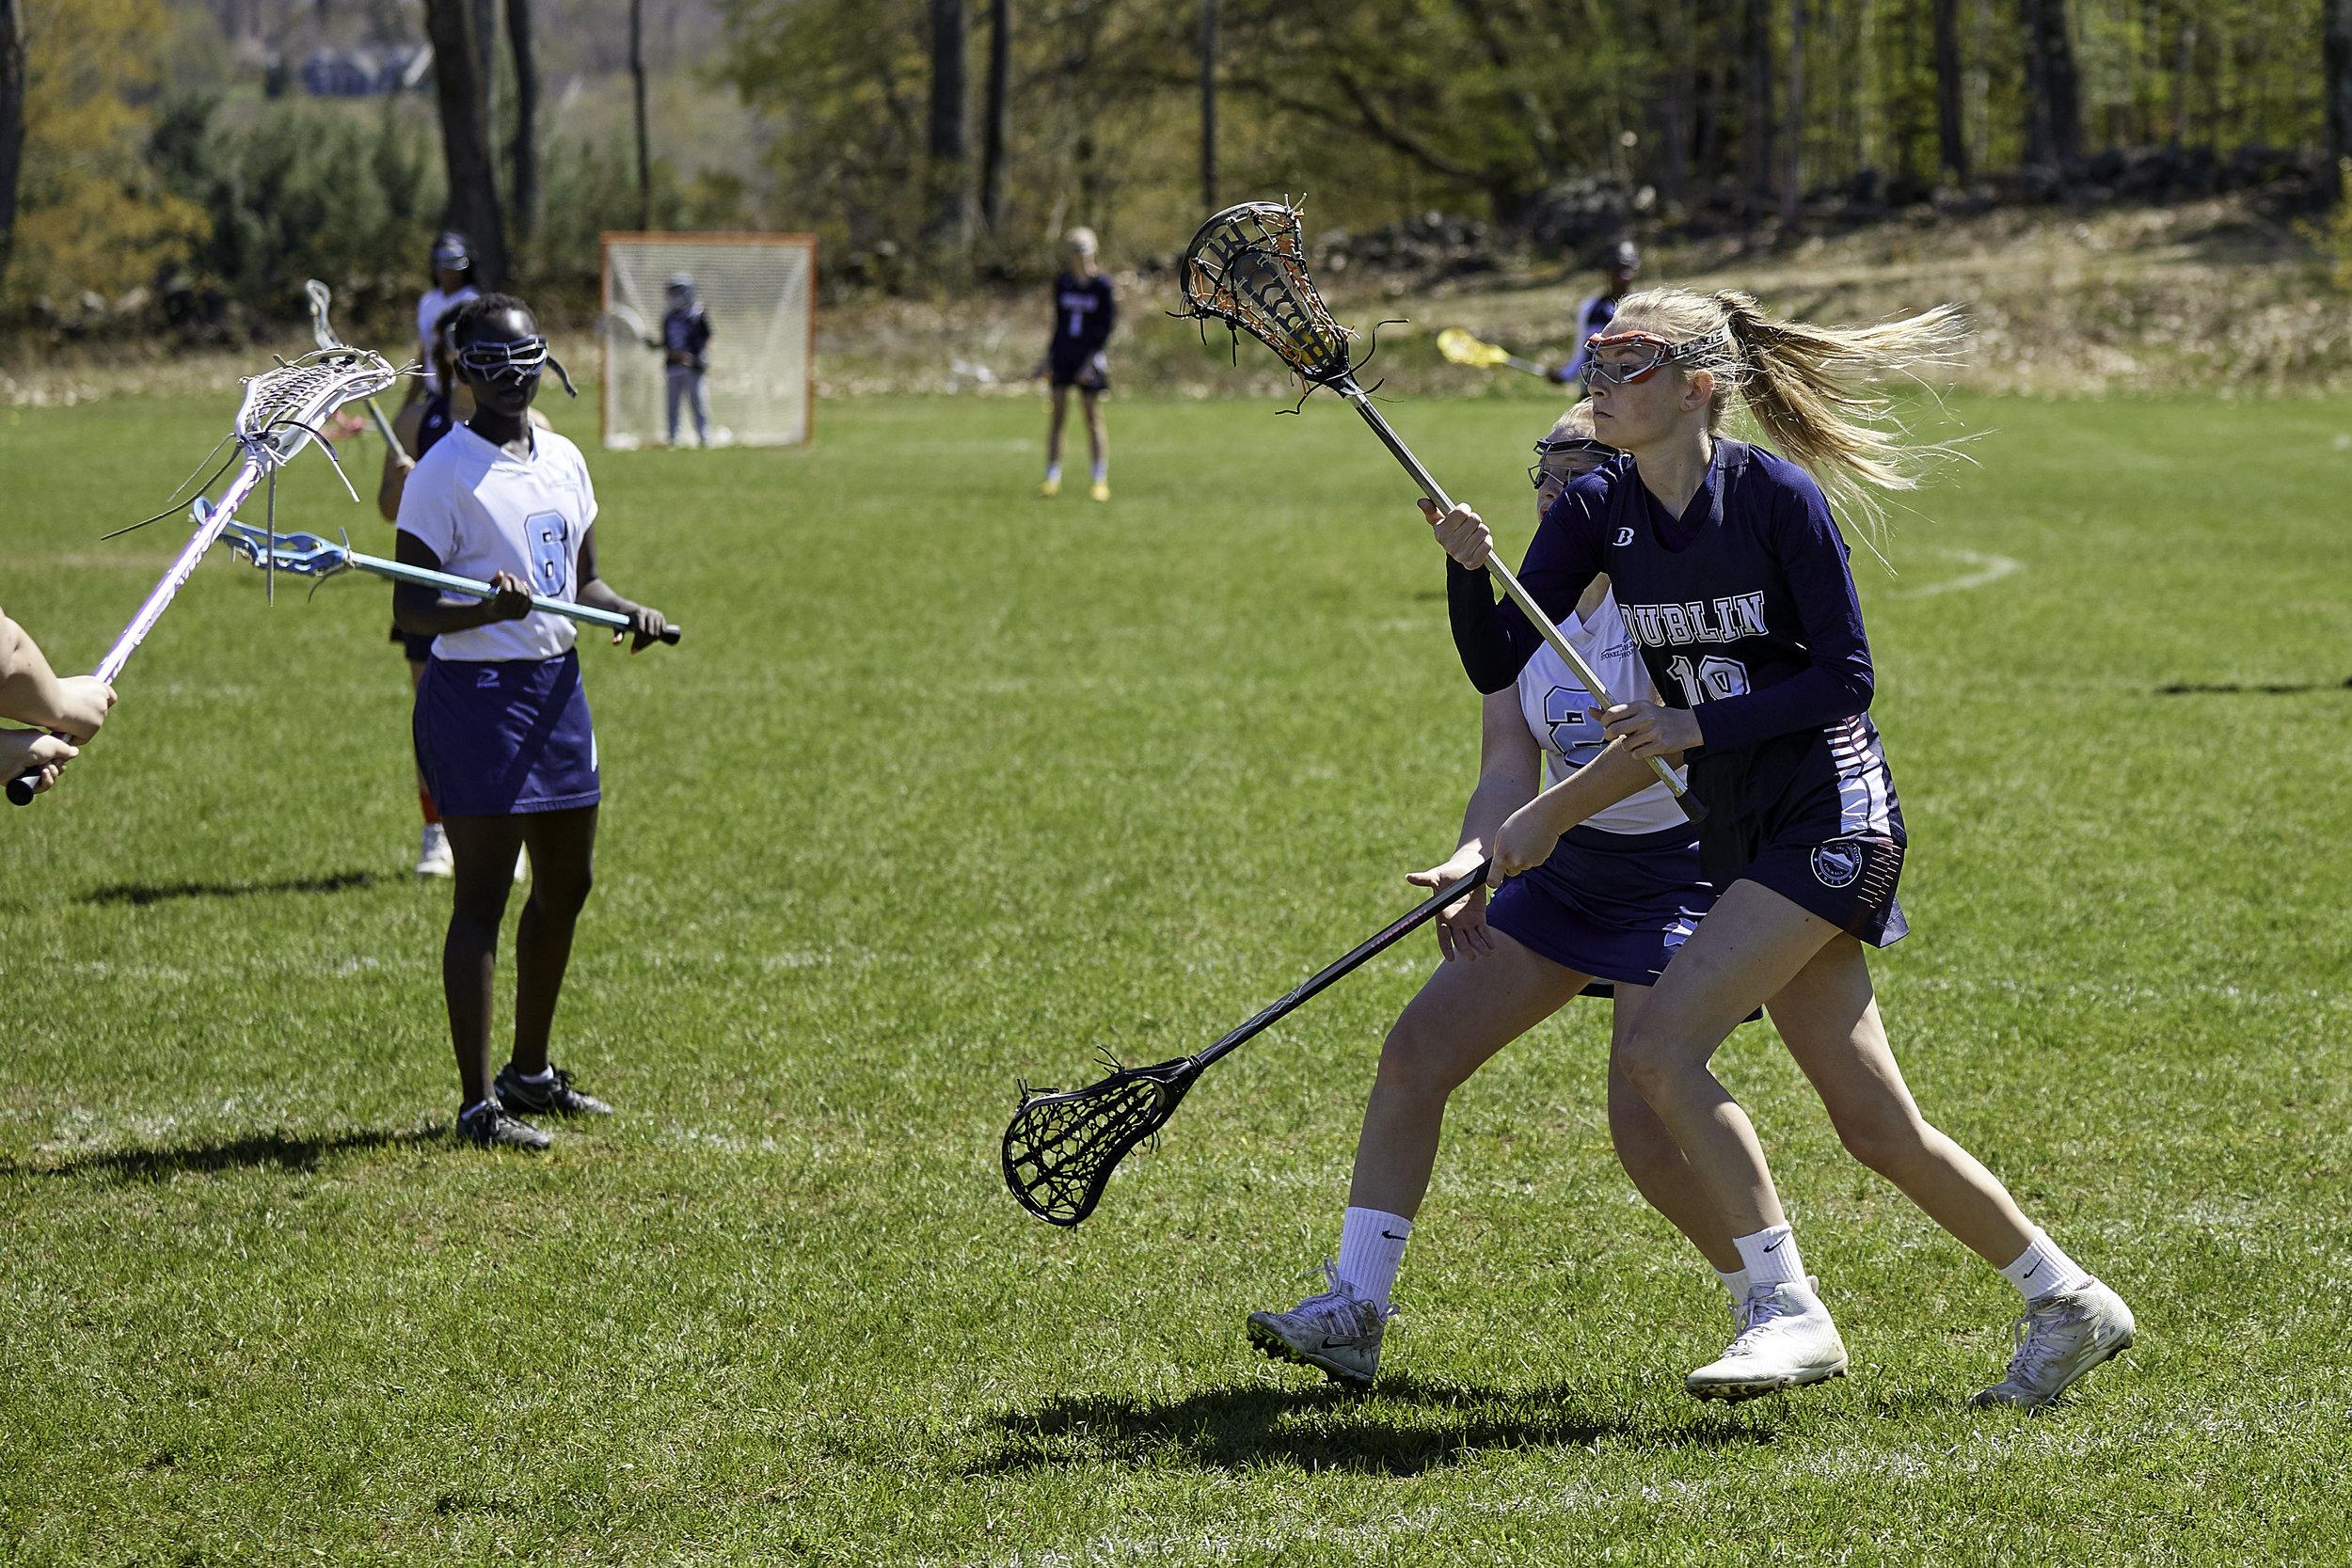 Girls Lacrosse vs. Stoneleigh Burnham School - May 11, 2019 - May 10, 2019193275.jpg